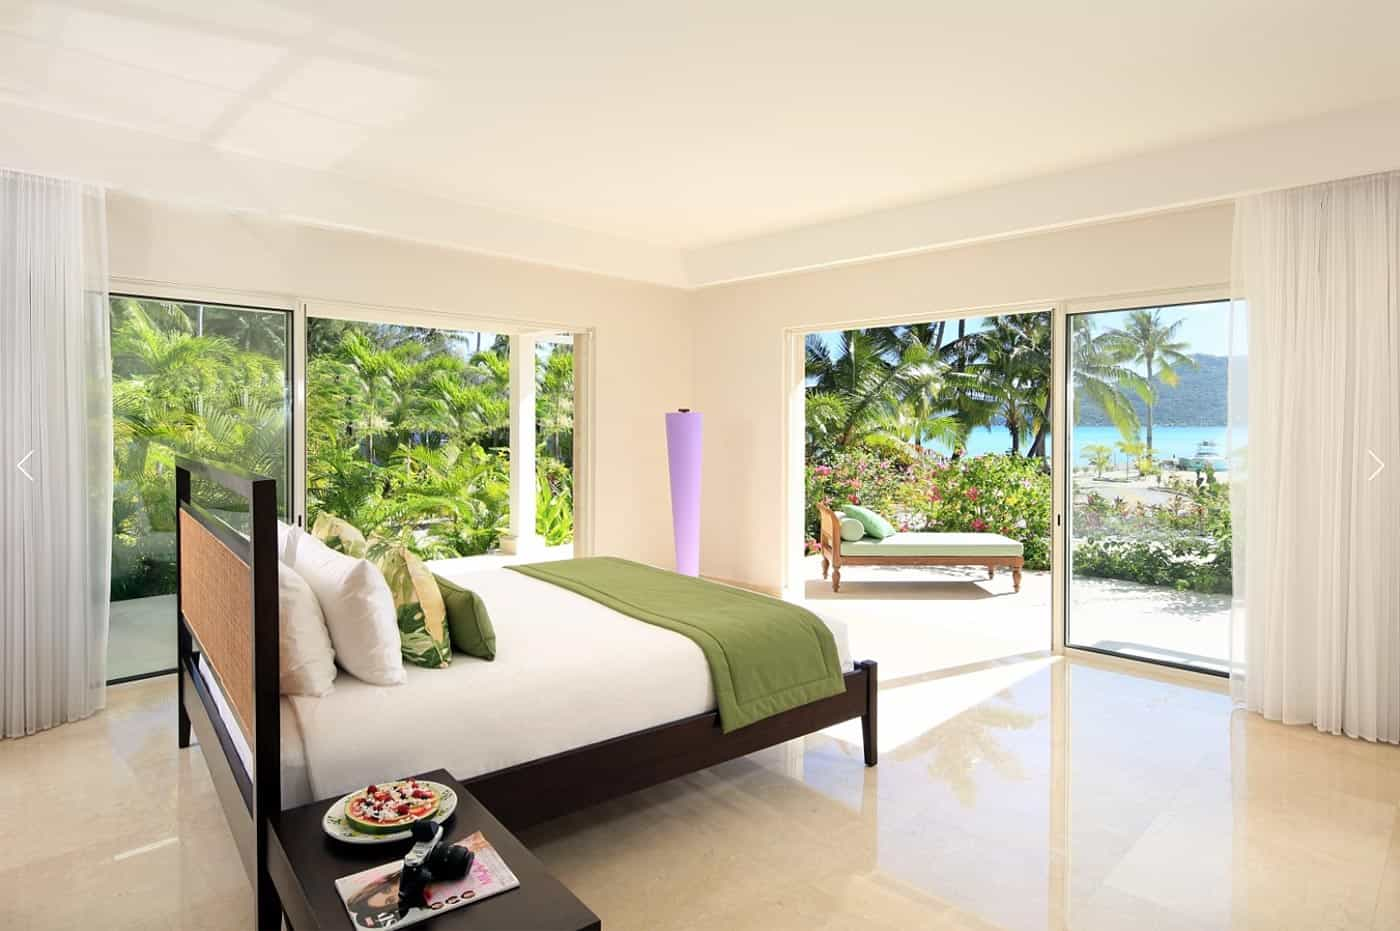 Bora Bora One private villa high quality | boraboraphotos.com